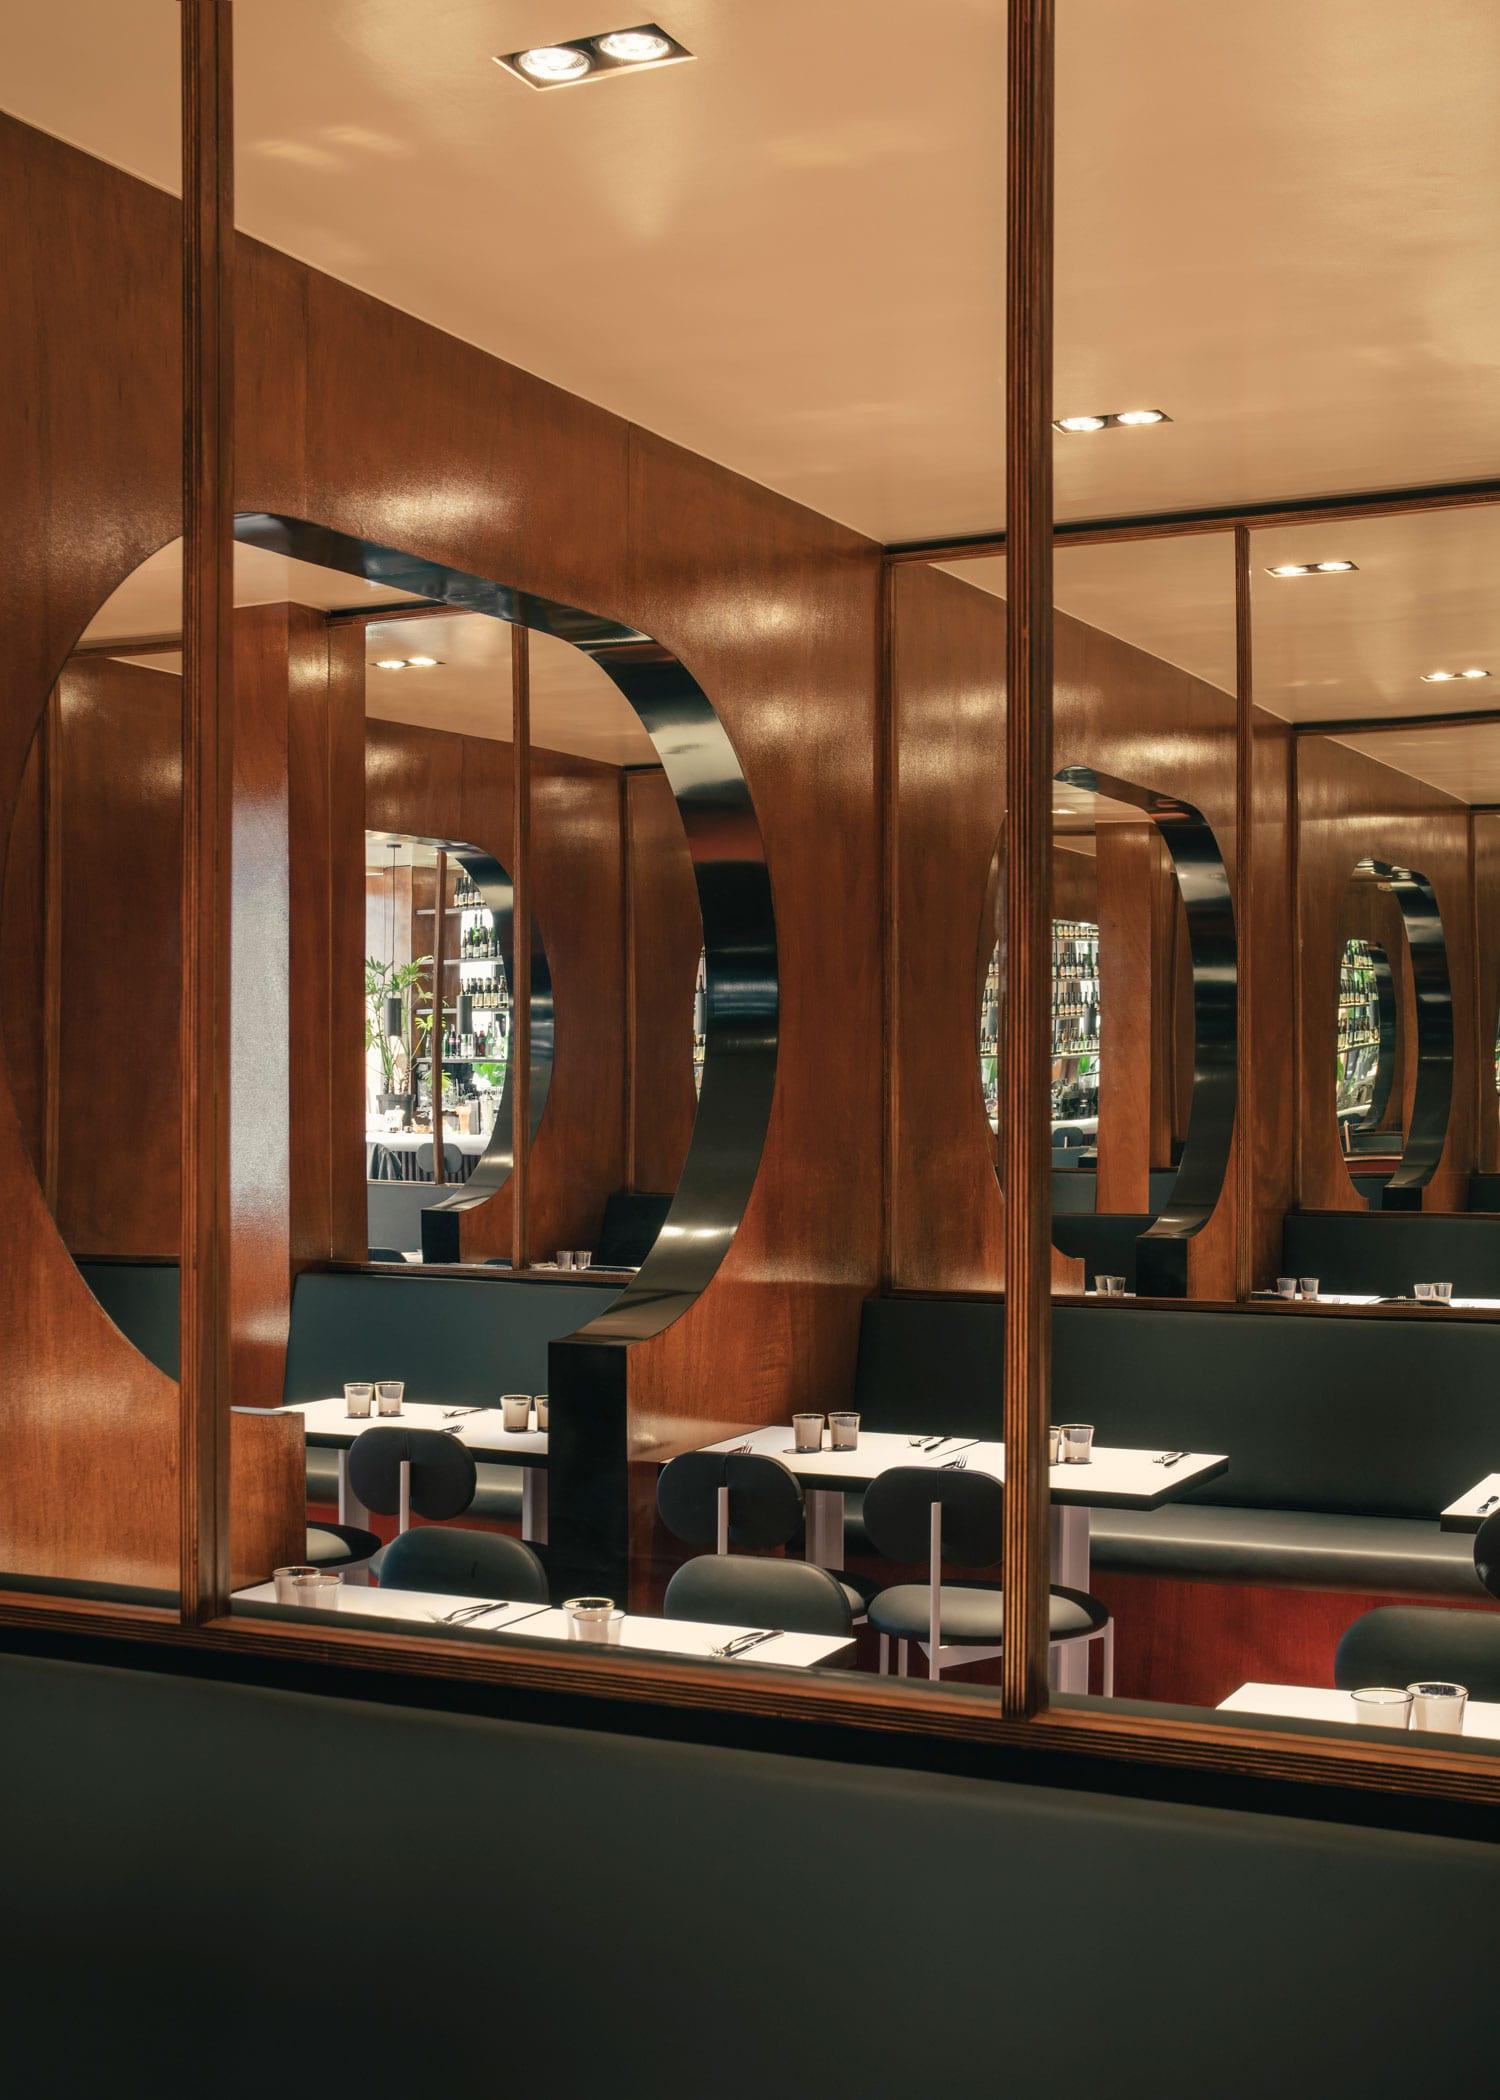 PNY Restaurant in Paris by Bernard Dubois | Yellowtrace